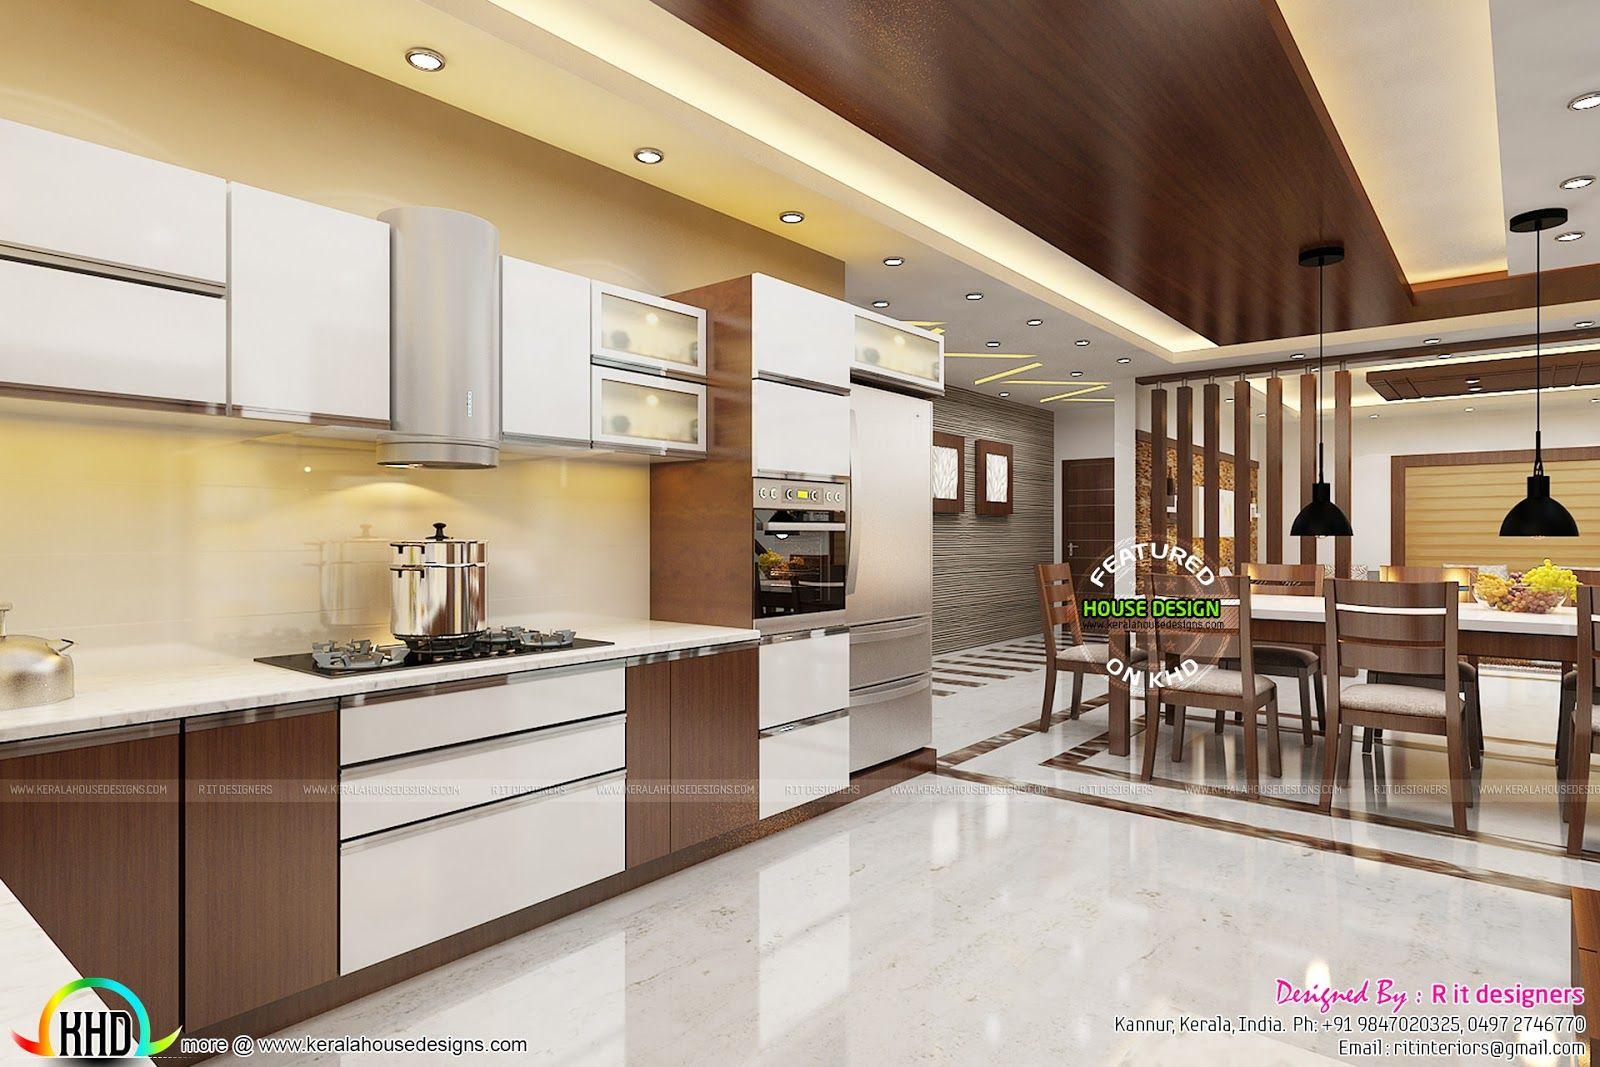 Kerala Homes Interior Kitchen Design Photos Interesting Pin By Eko Hermin Dani On Home Interior Design Kitchen 844 2